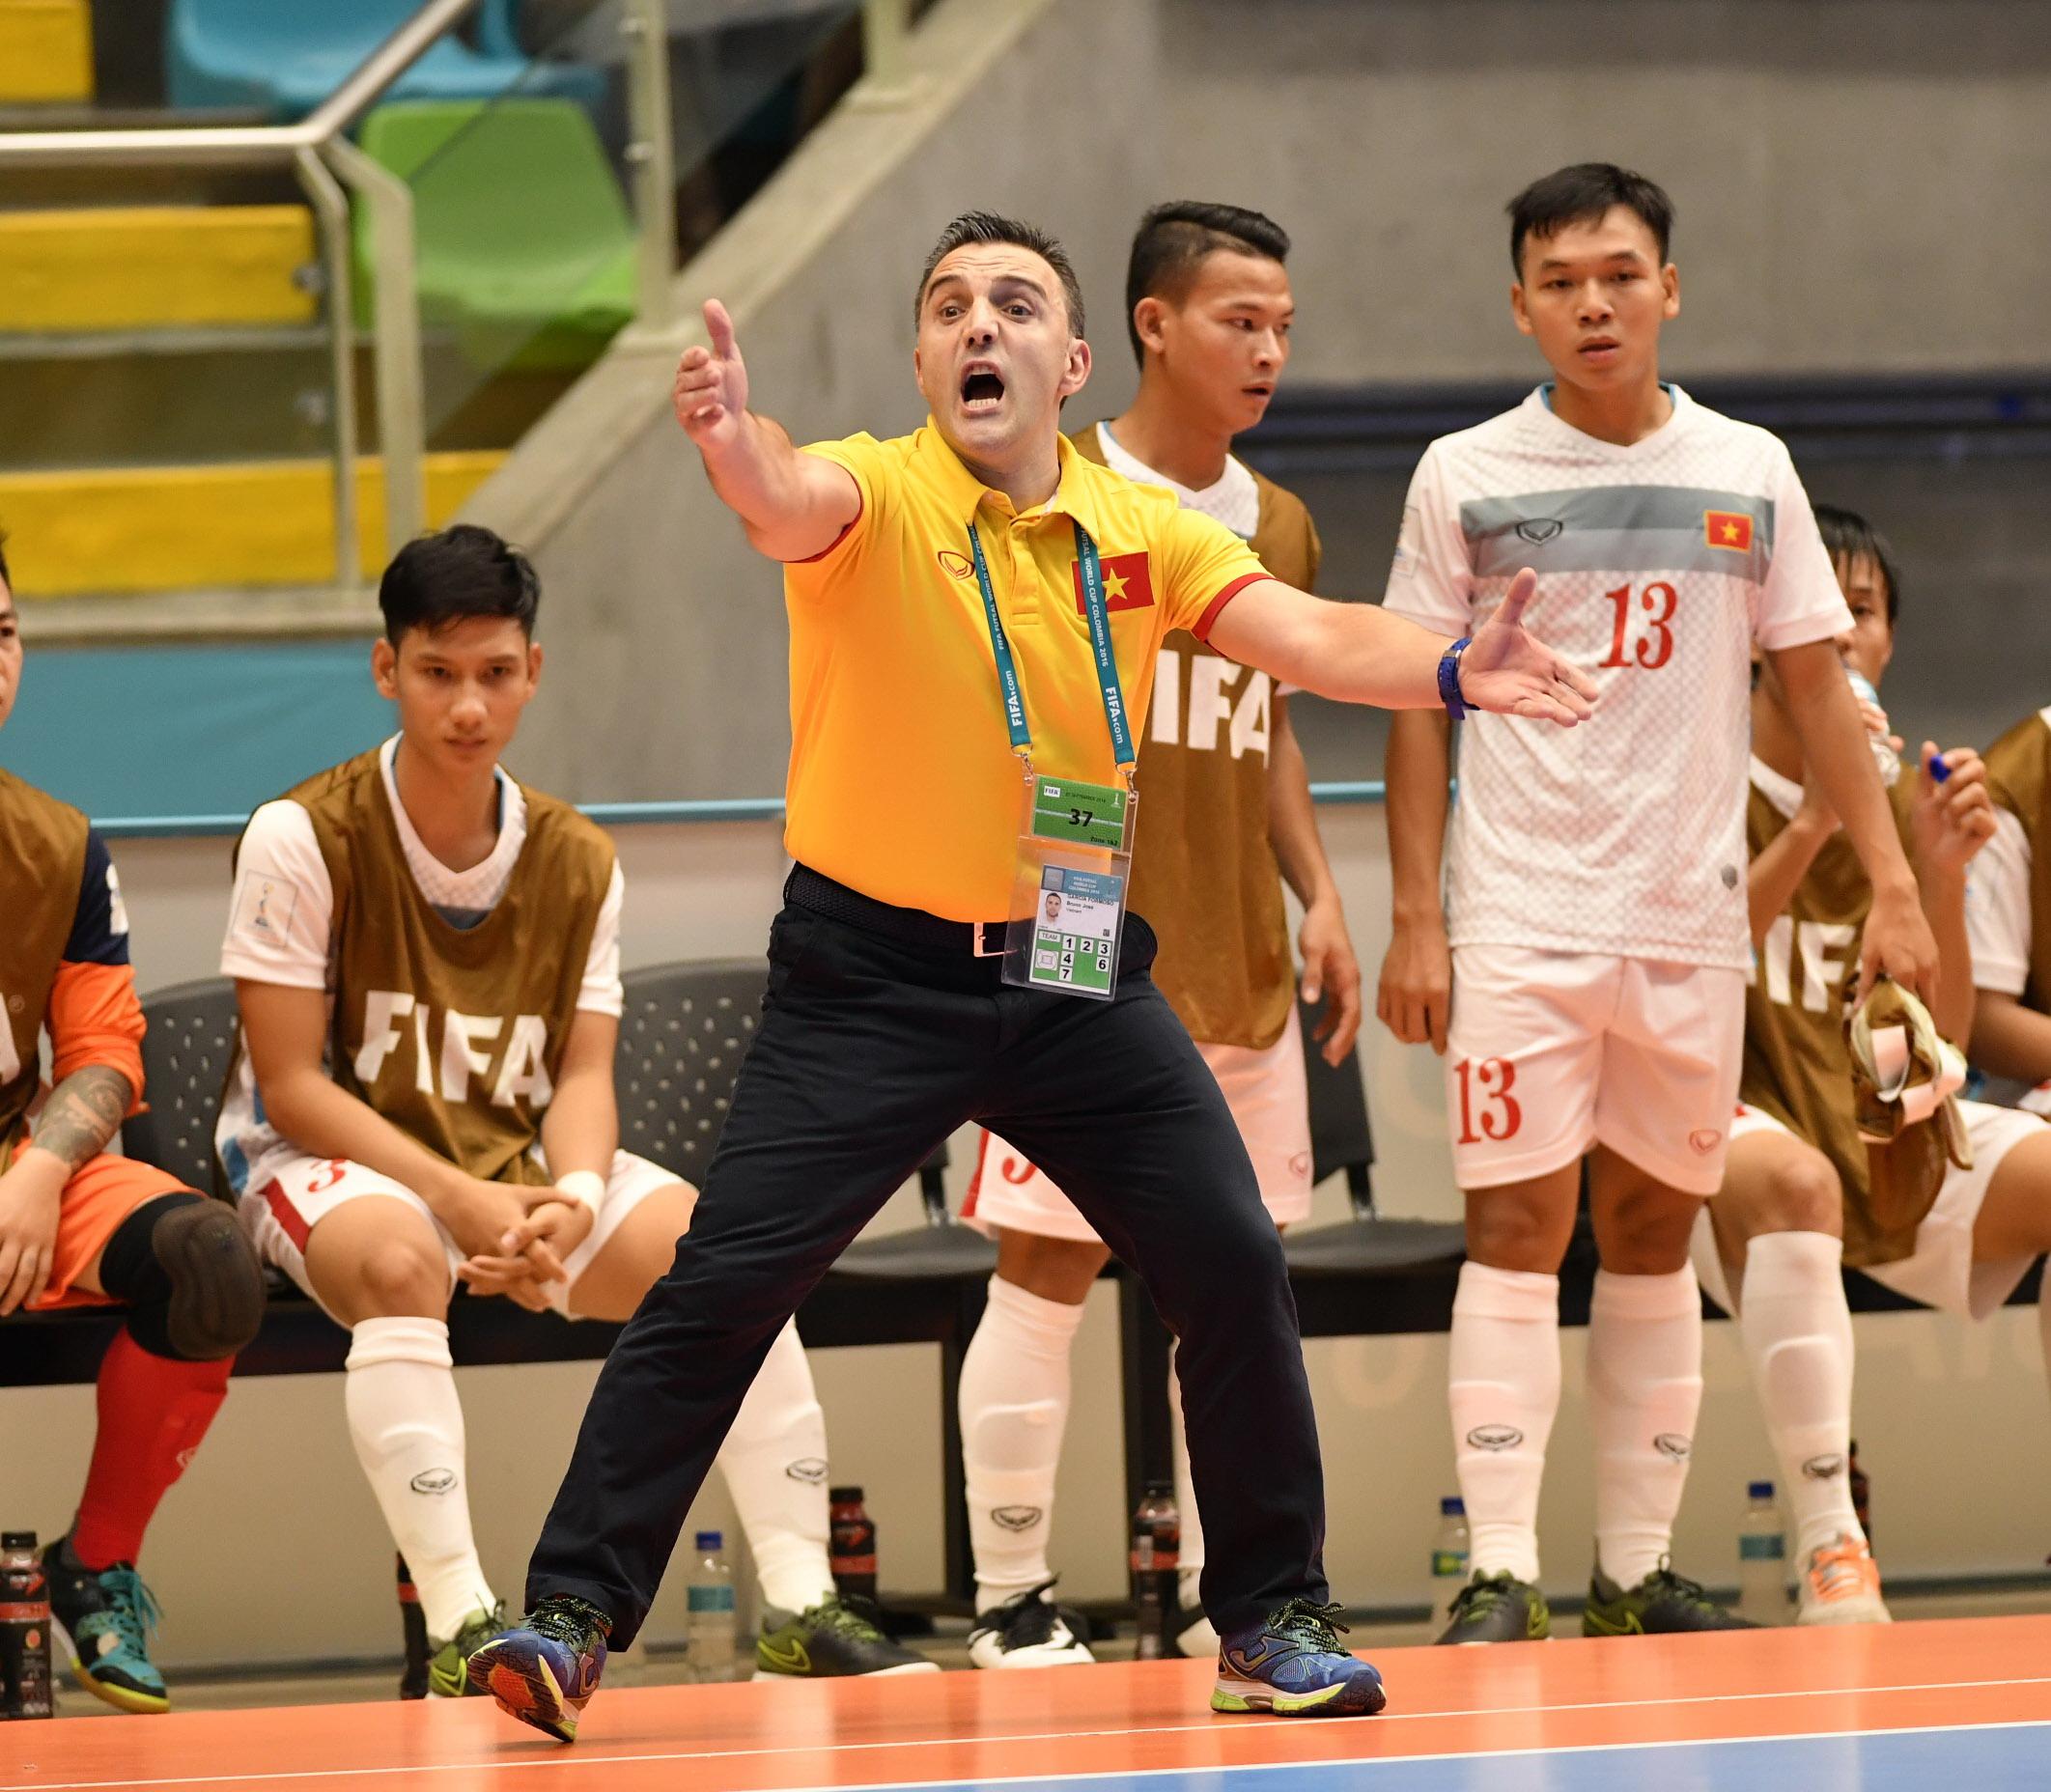 Chia tay futsal VN, HLV Bruno dẫn dắt tuyển futsal Nhật Bản